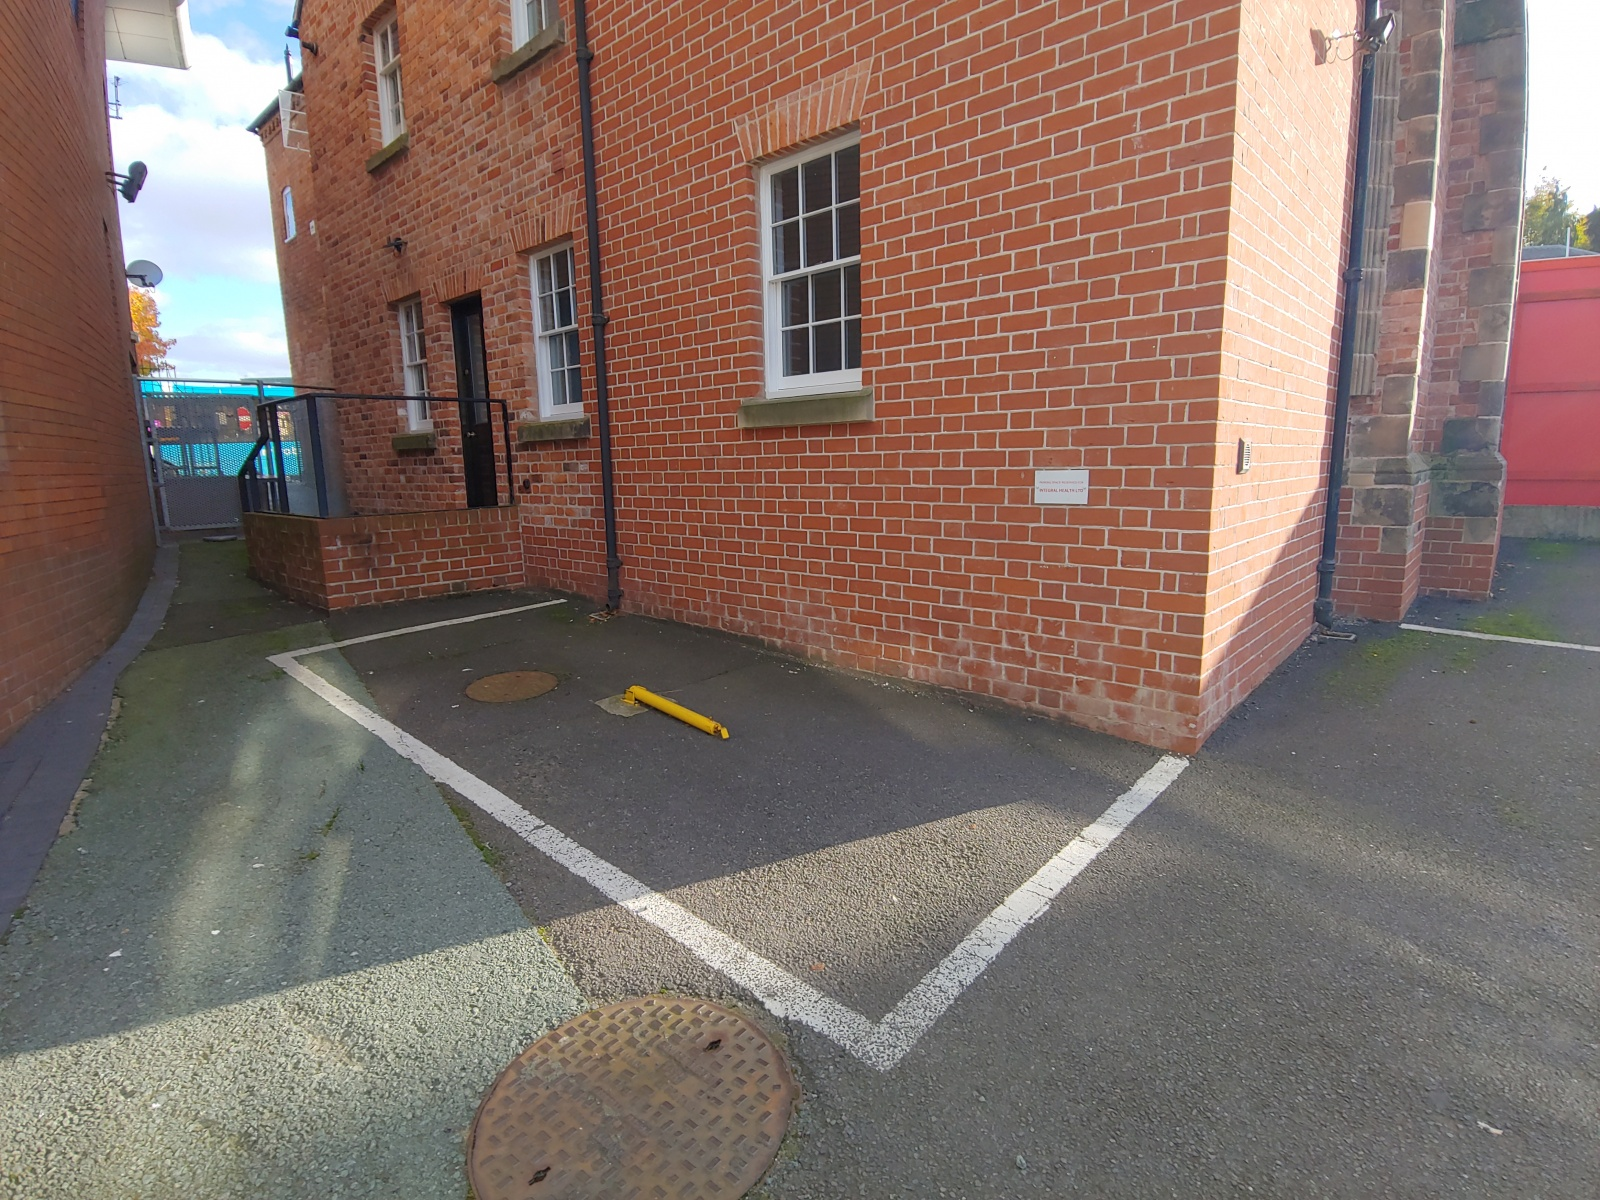 The Old School House, 4 St Austins Friars, Shrewsbury, Shropshire